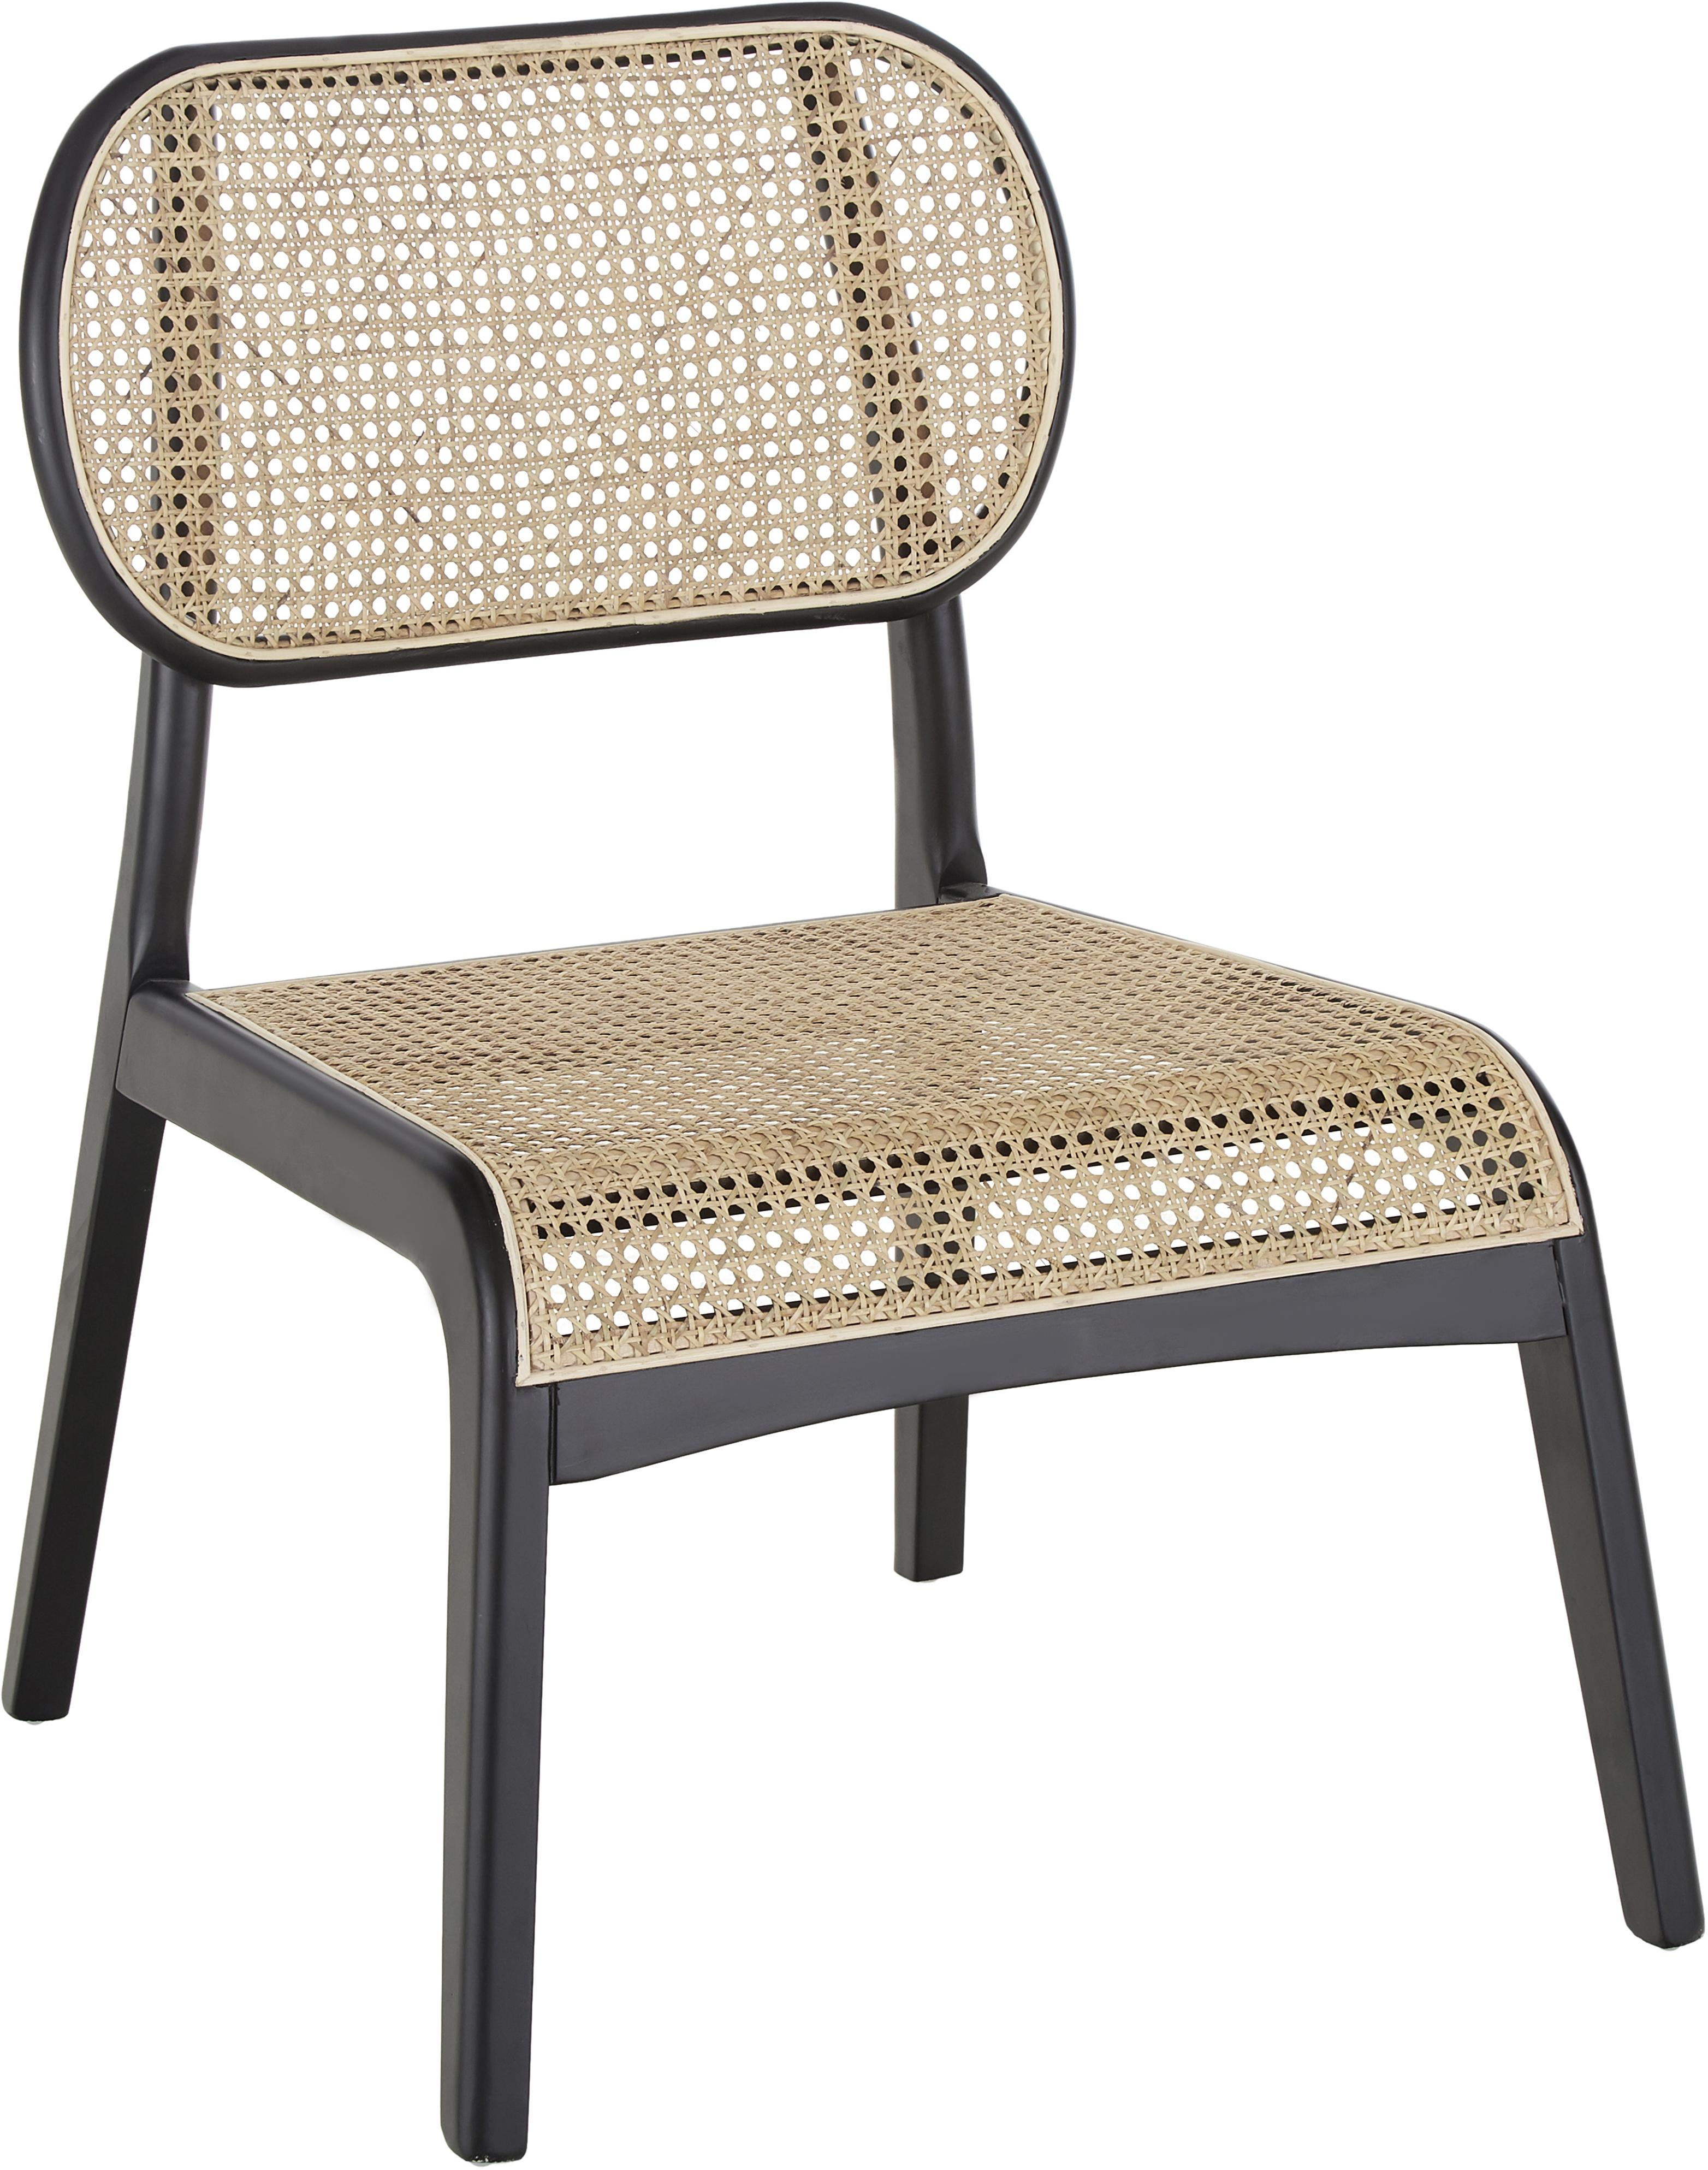 Loungefauteuil Franz met Weens vlechtwerk, Zitvlak: rotan, Frame: massief gelakt berkenhout, Zitvlak: rotankleurig. Frame: zwart gelakt berkenhout, B 61  x D 63 cm